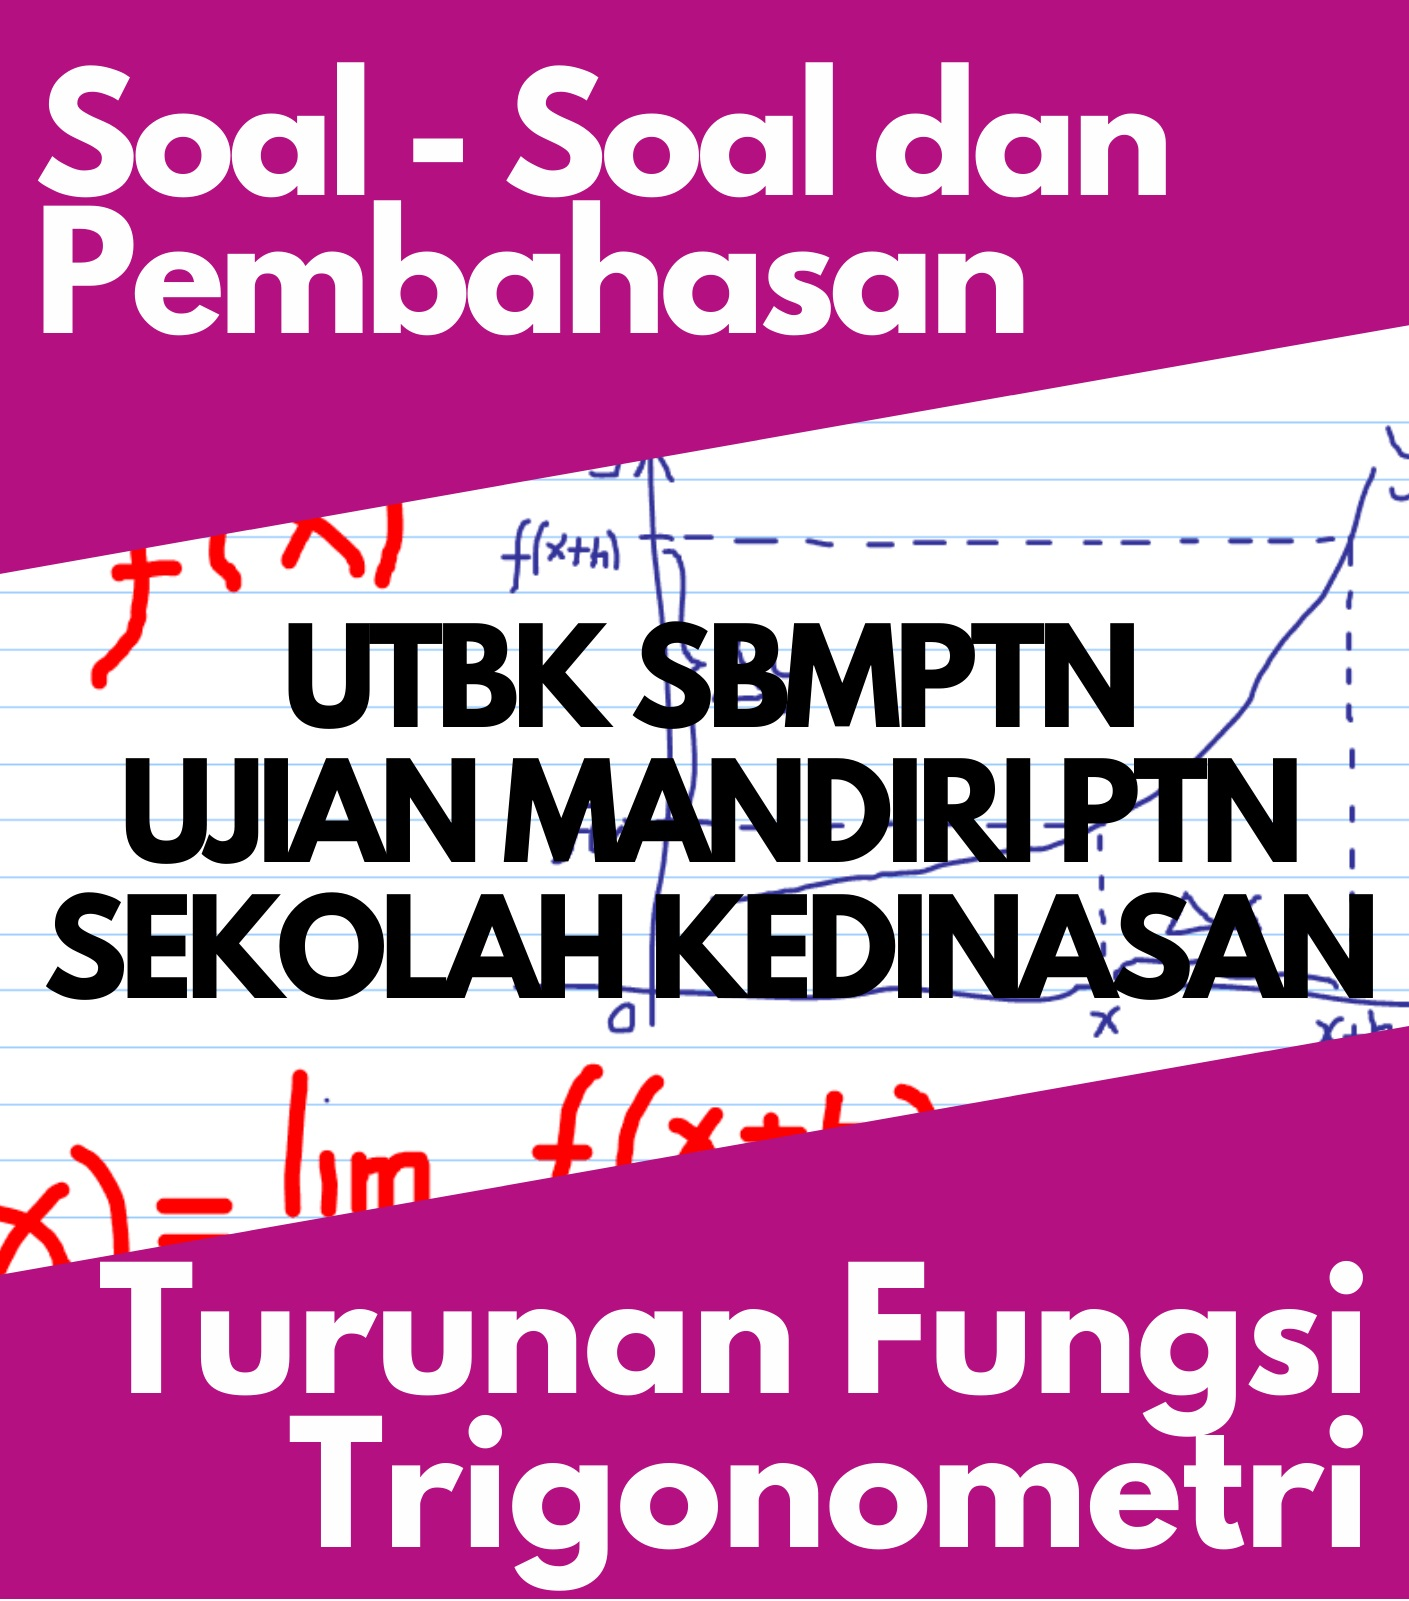 Bank Soal dan Pembahasan Matematika Dasar Turunan Fungsi Trigonometri